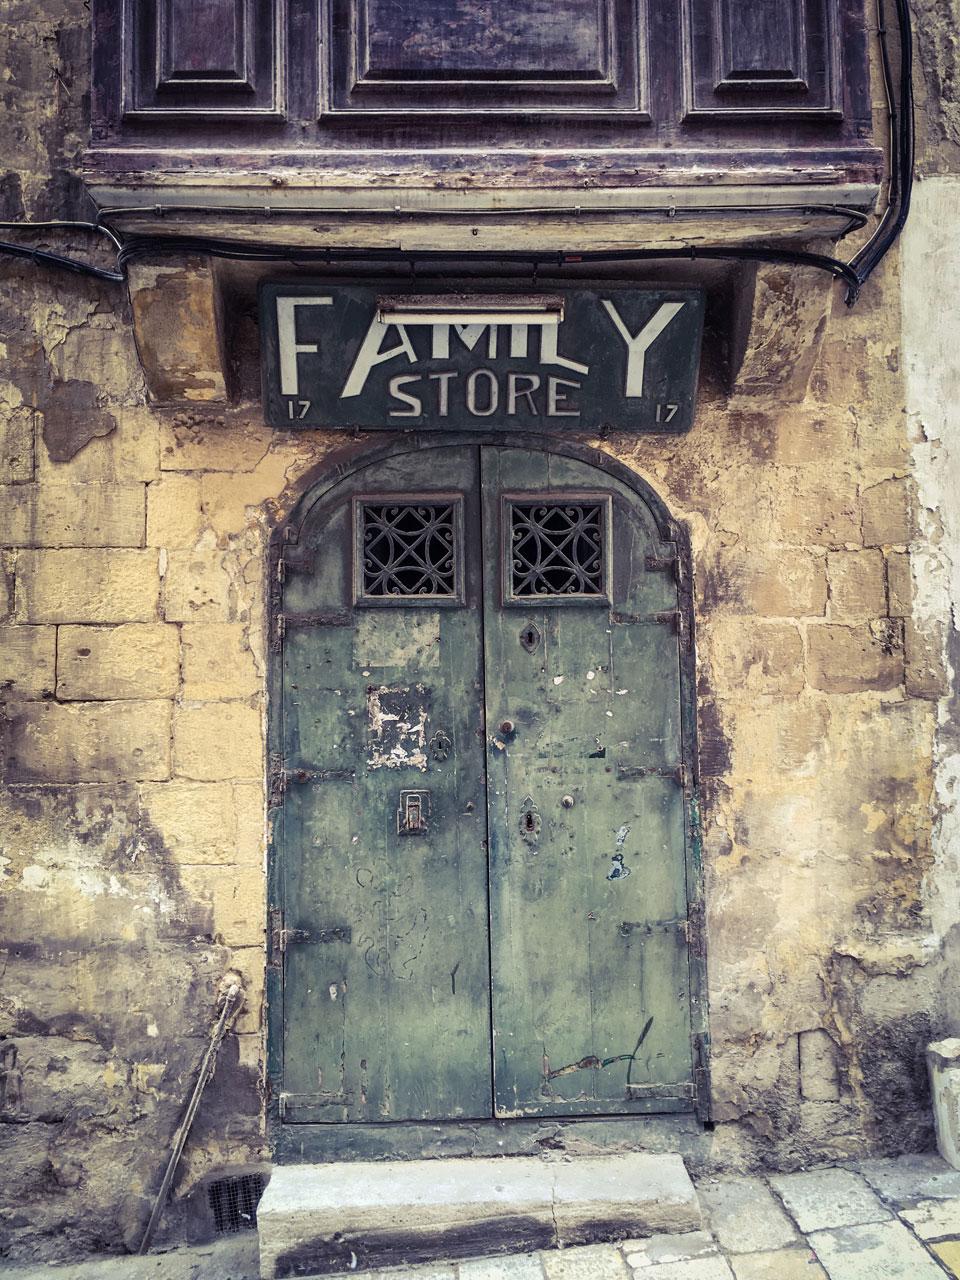 disappearingMalta - The Family Store, Triq I-Arcisqof, Valletta, Malta - vintage storefront ©Helen Jones-Florio photography prints